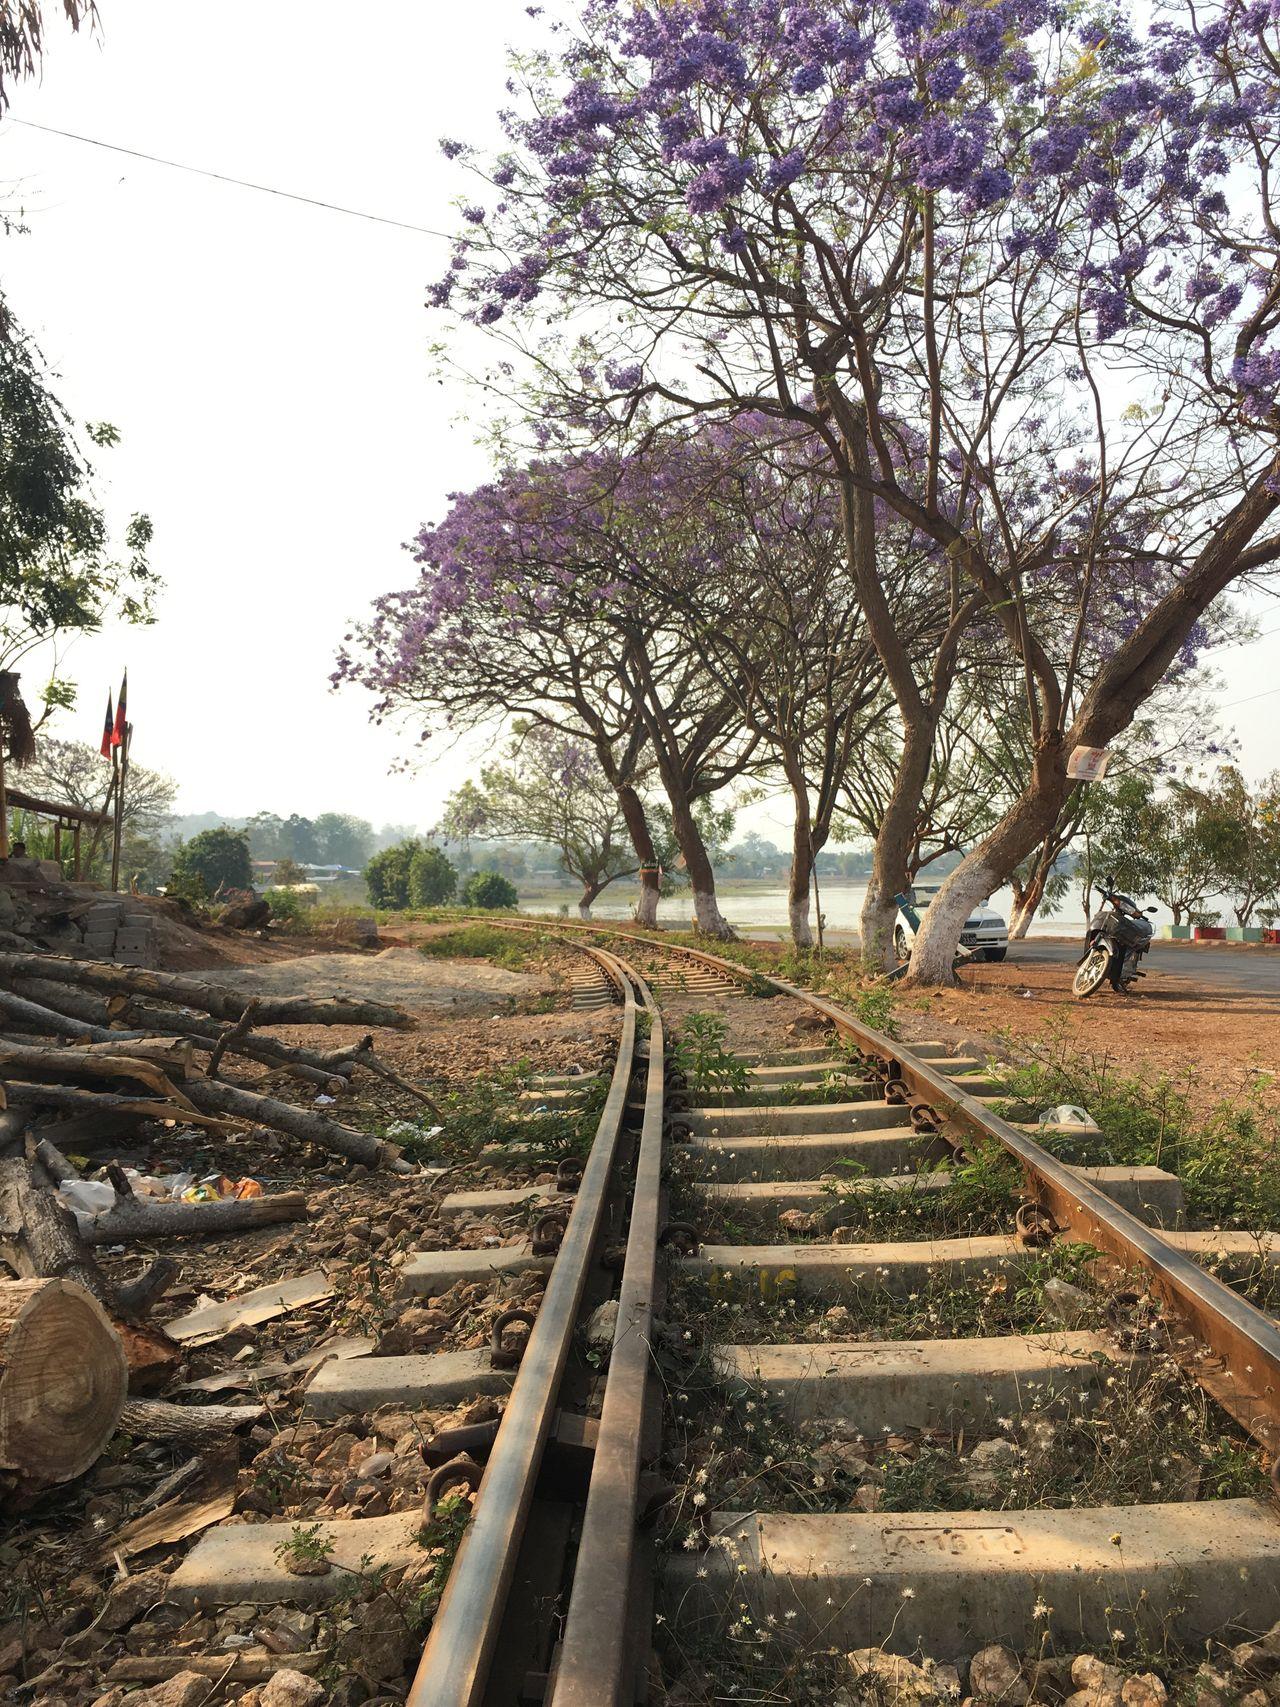 Railroad Track Railing Blue Flowers Phe Kone